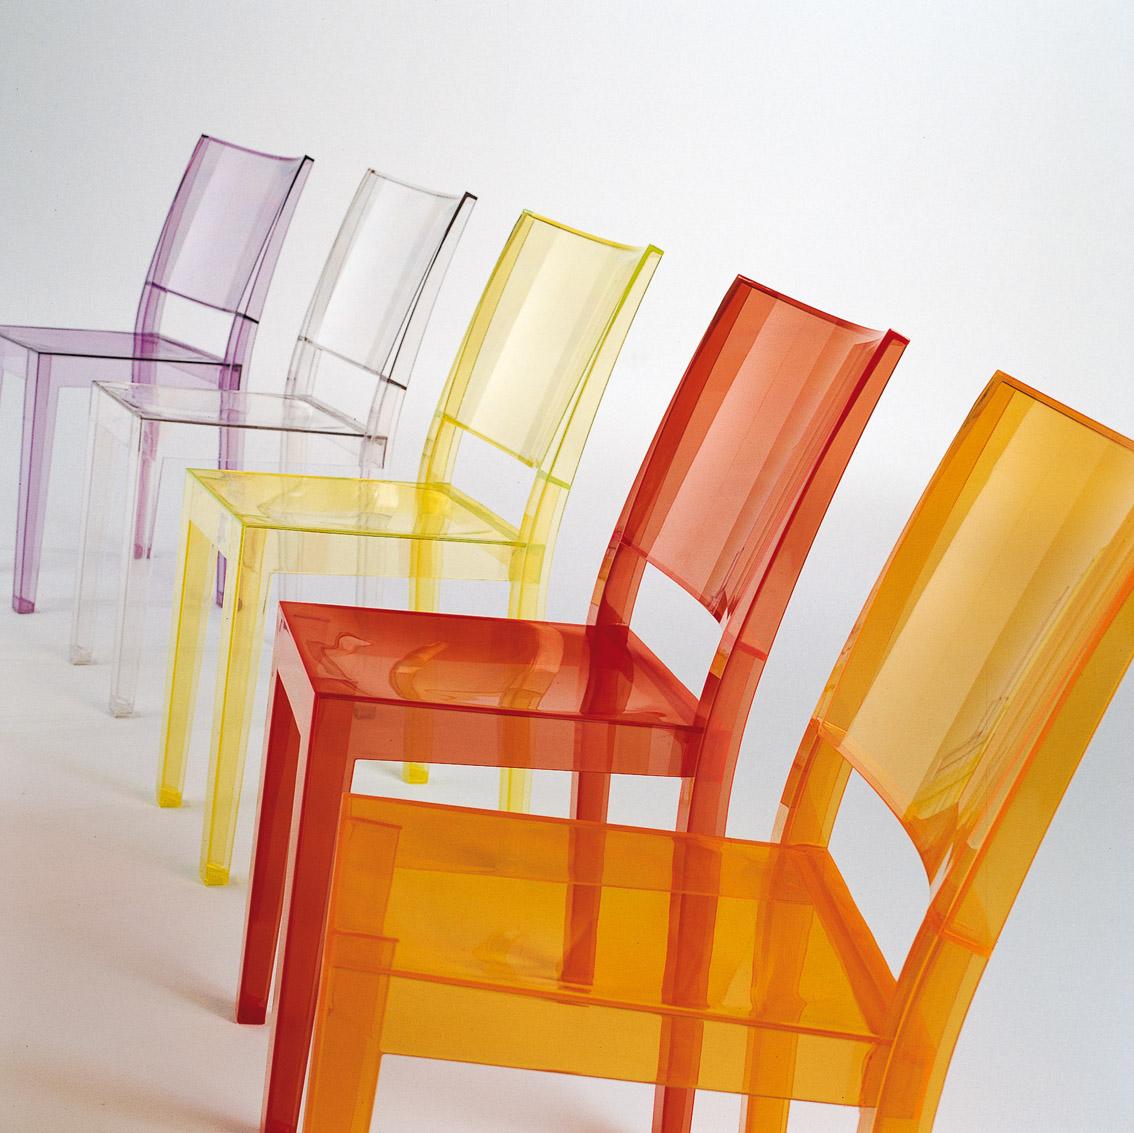 Sedie Plastica Trasparente Colorate.La Marie Kartell Philippe Starck Klat